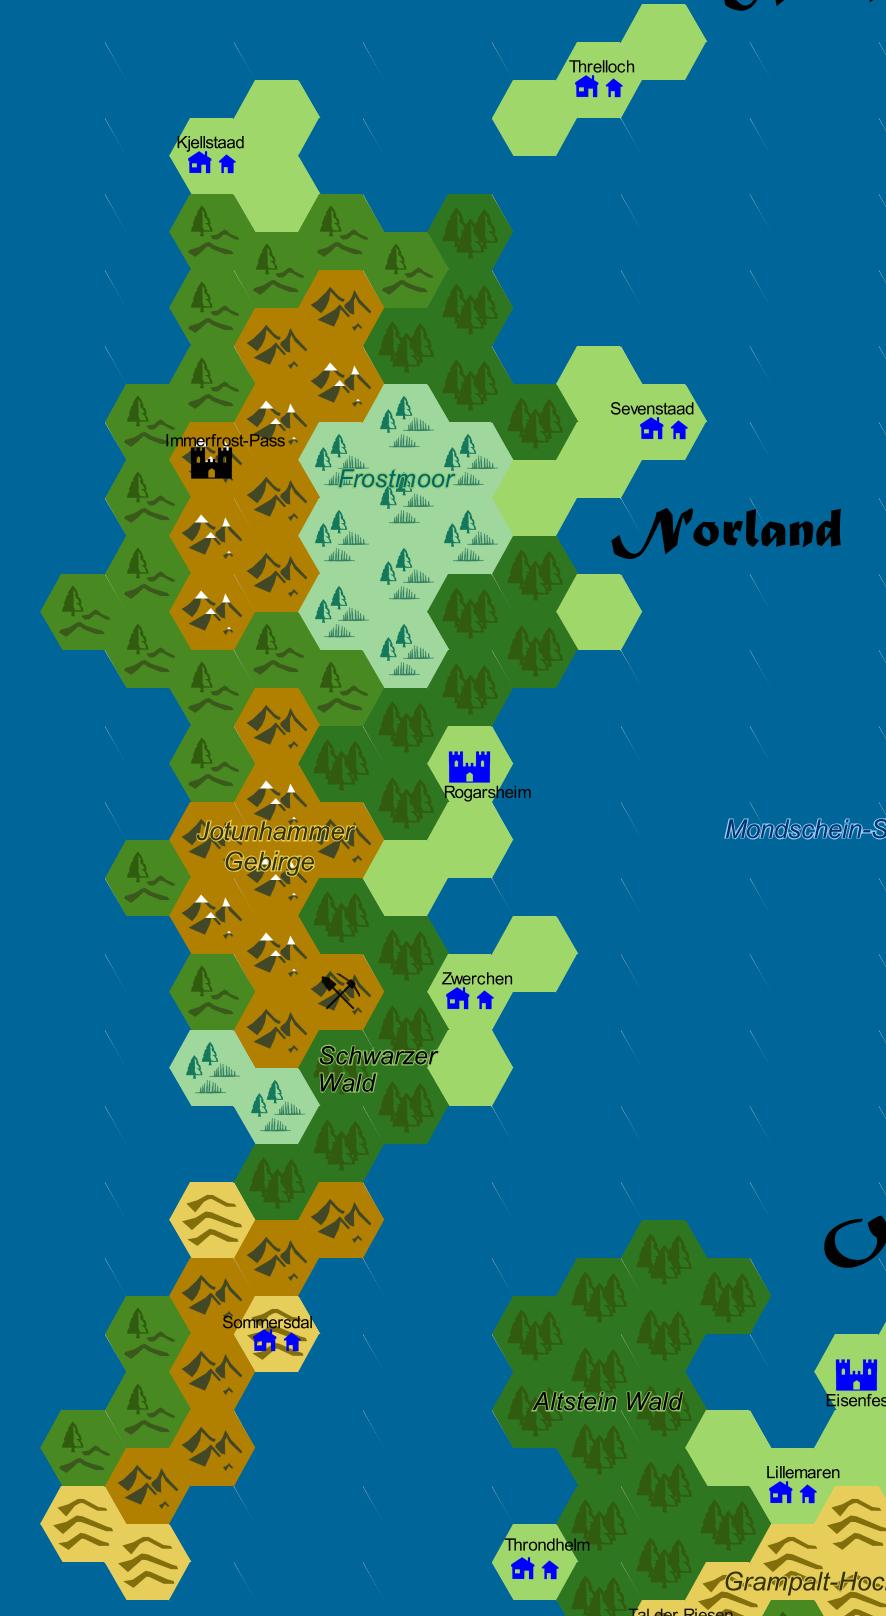 InselNorland